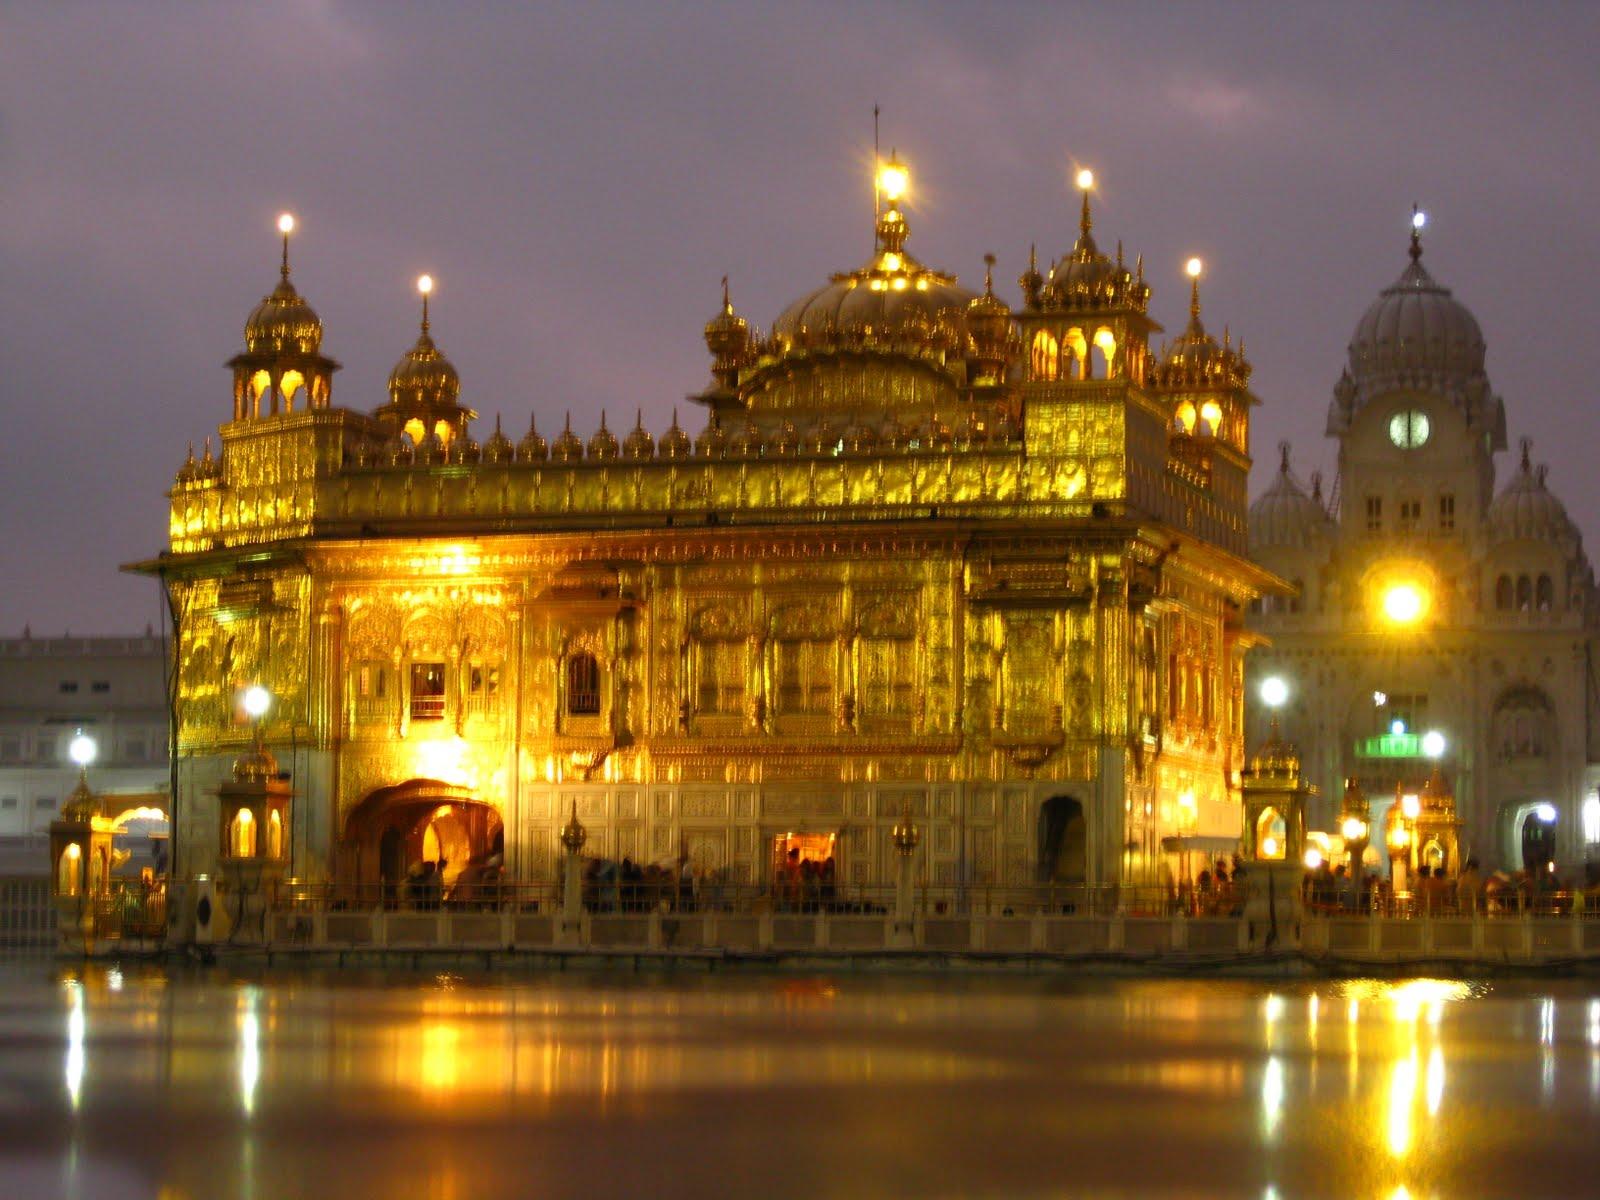 Amritsar Manali Shimla Delhi Tour Package